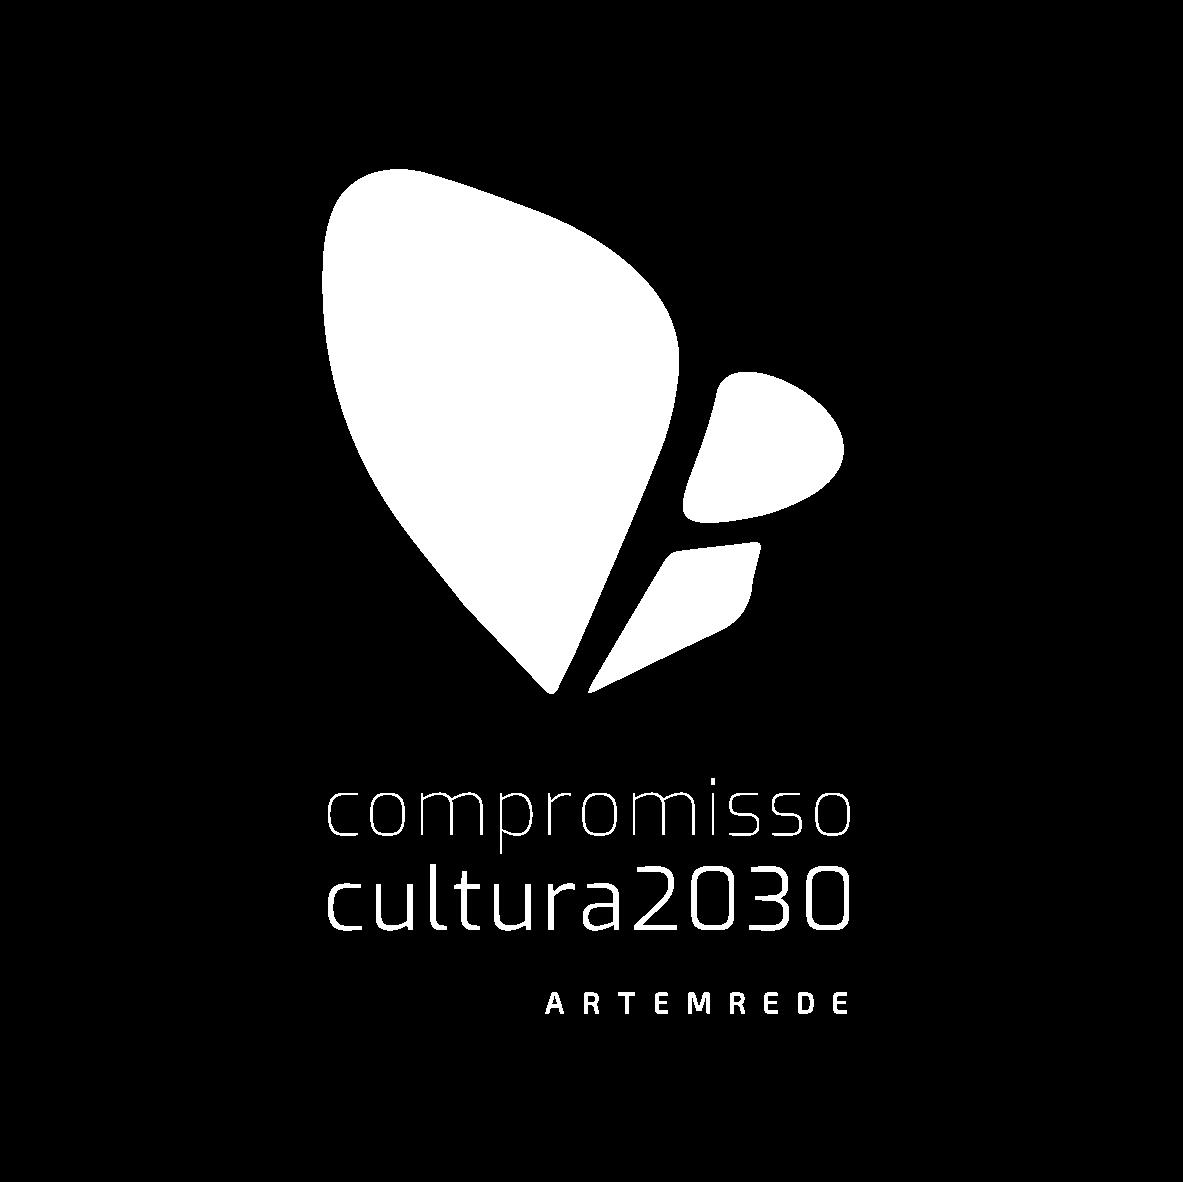 Compromisso Cultura 2030